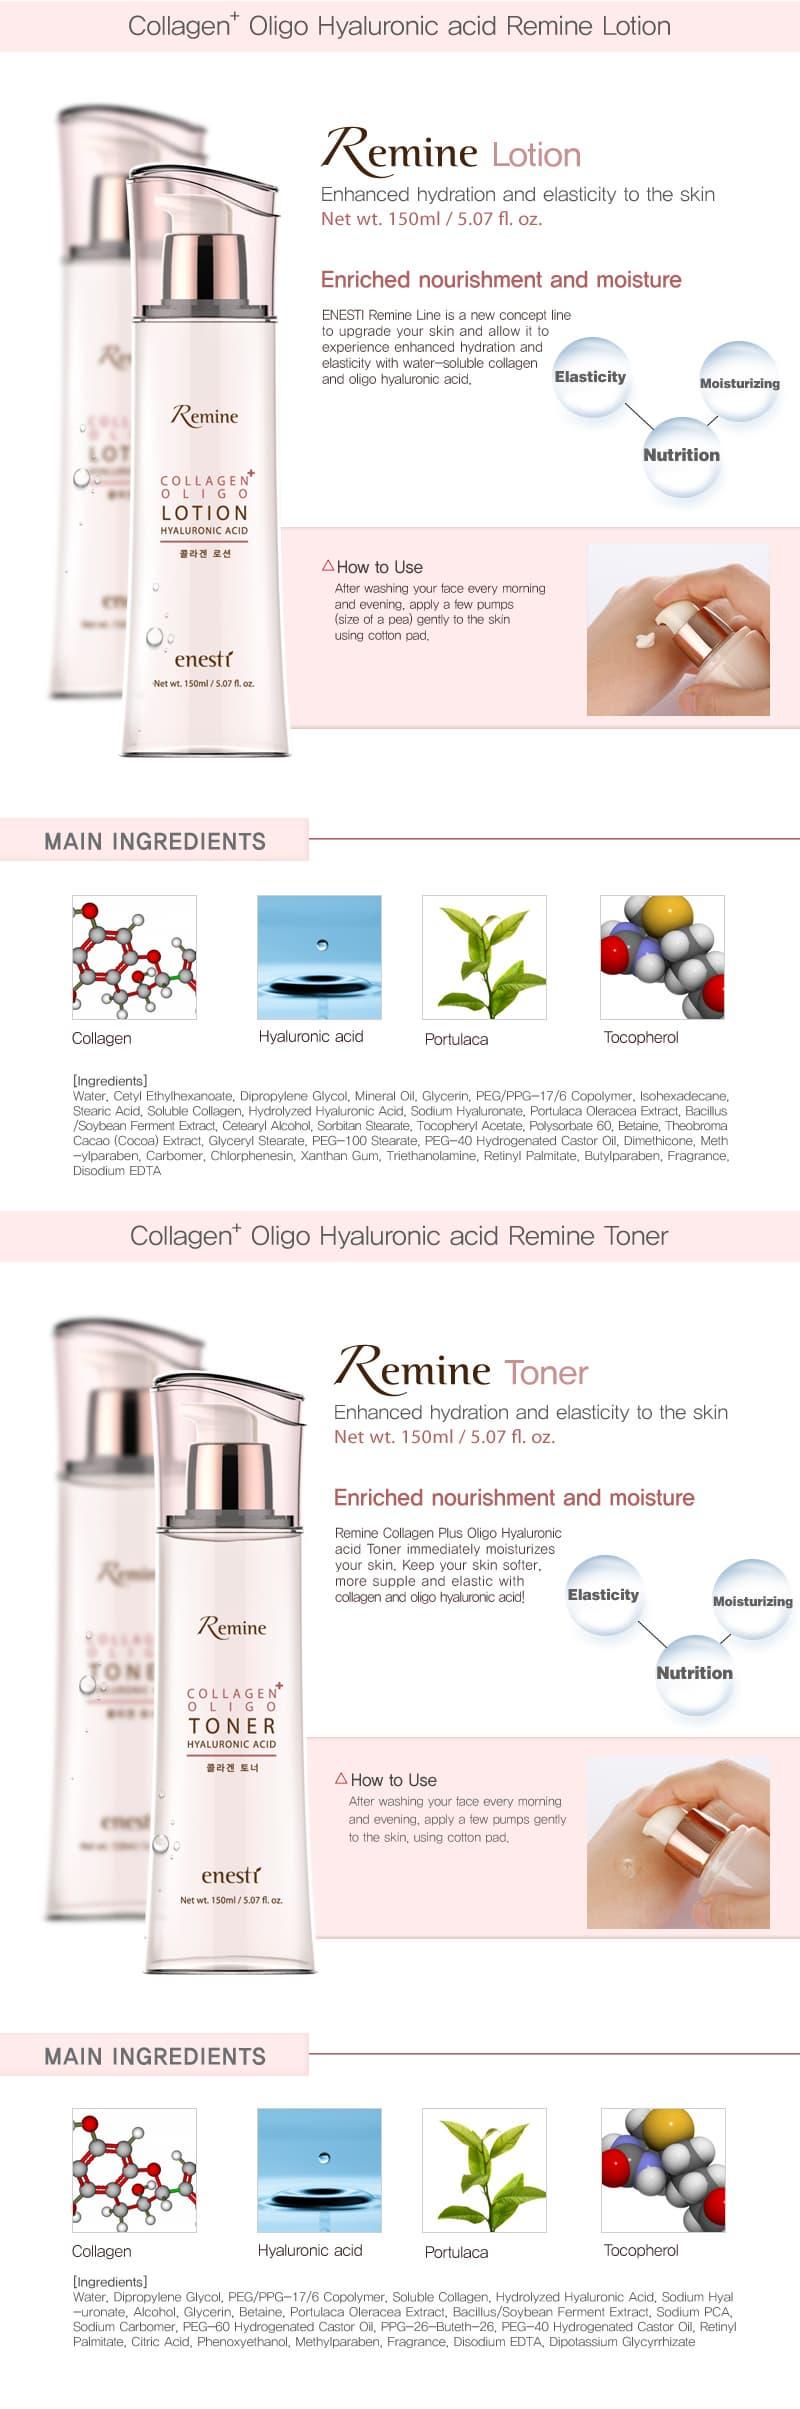 Remine Collagen Hyaluronic acid Skincare | tradekorea